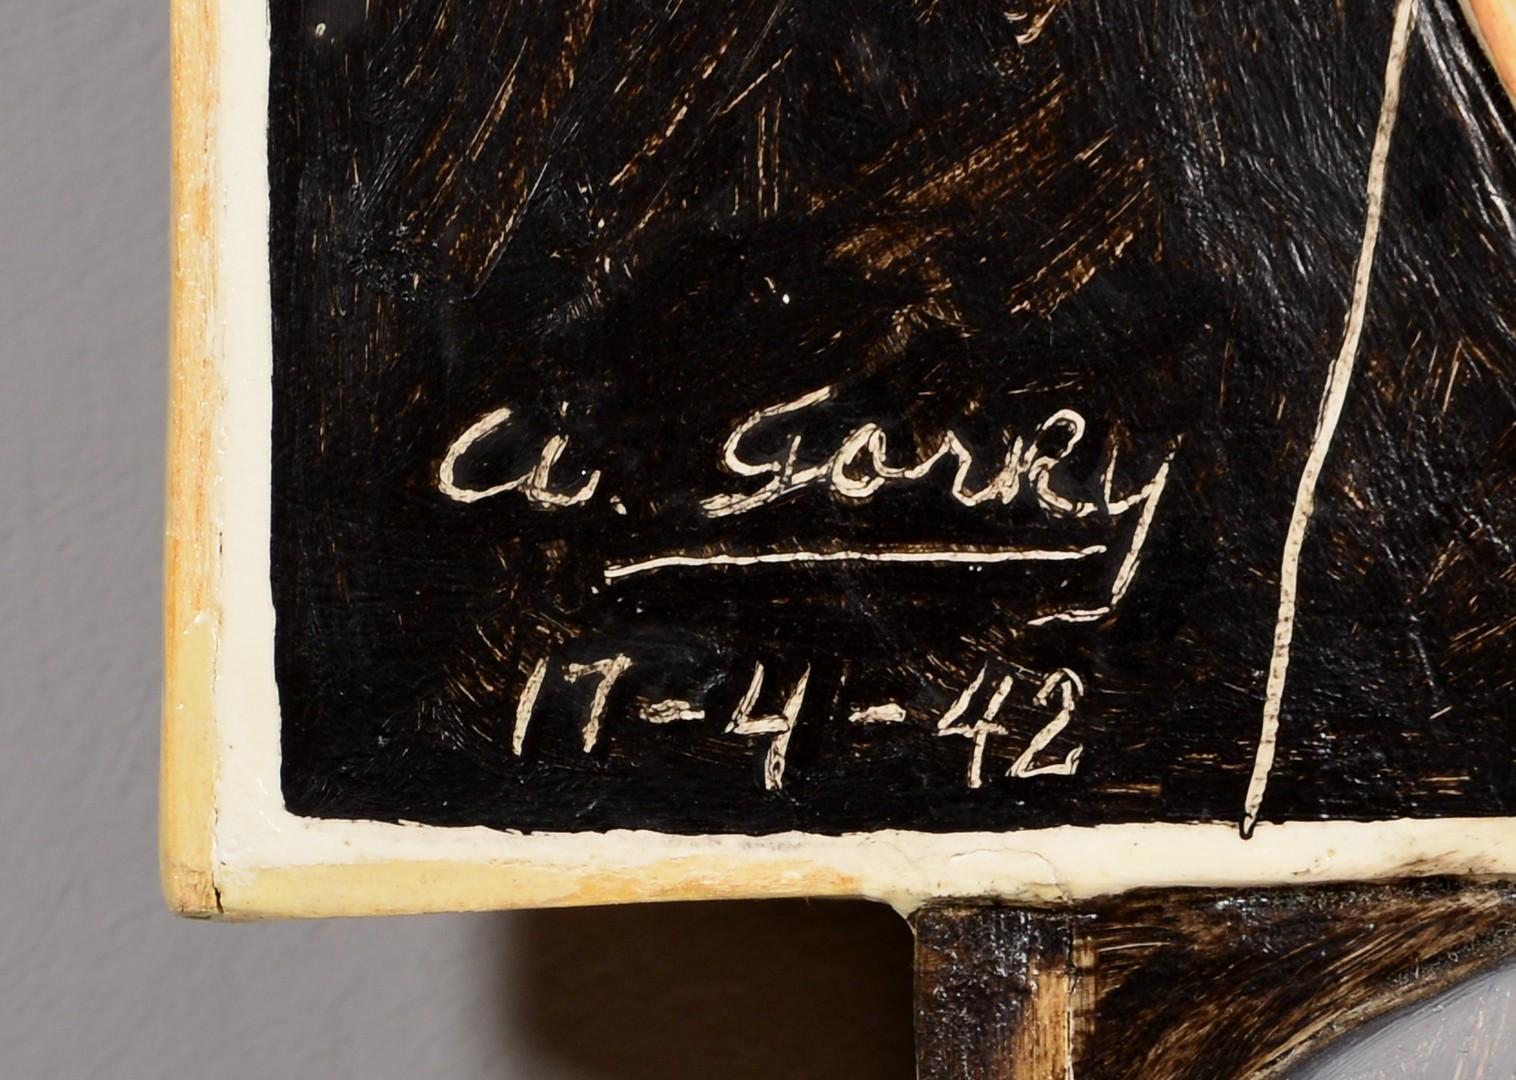 Lot 4010159: Jonathan Santlofer portraits: Gorky & Delaunays